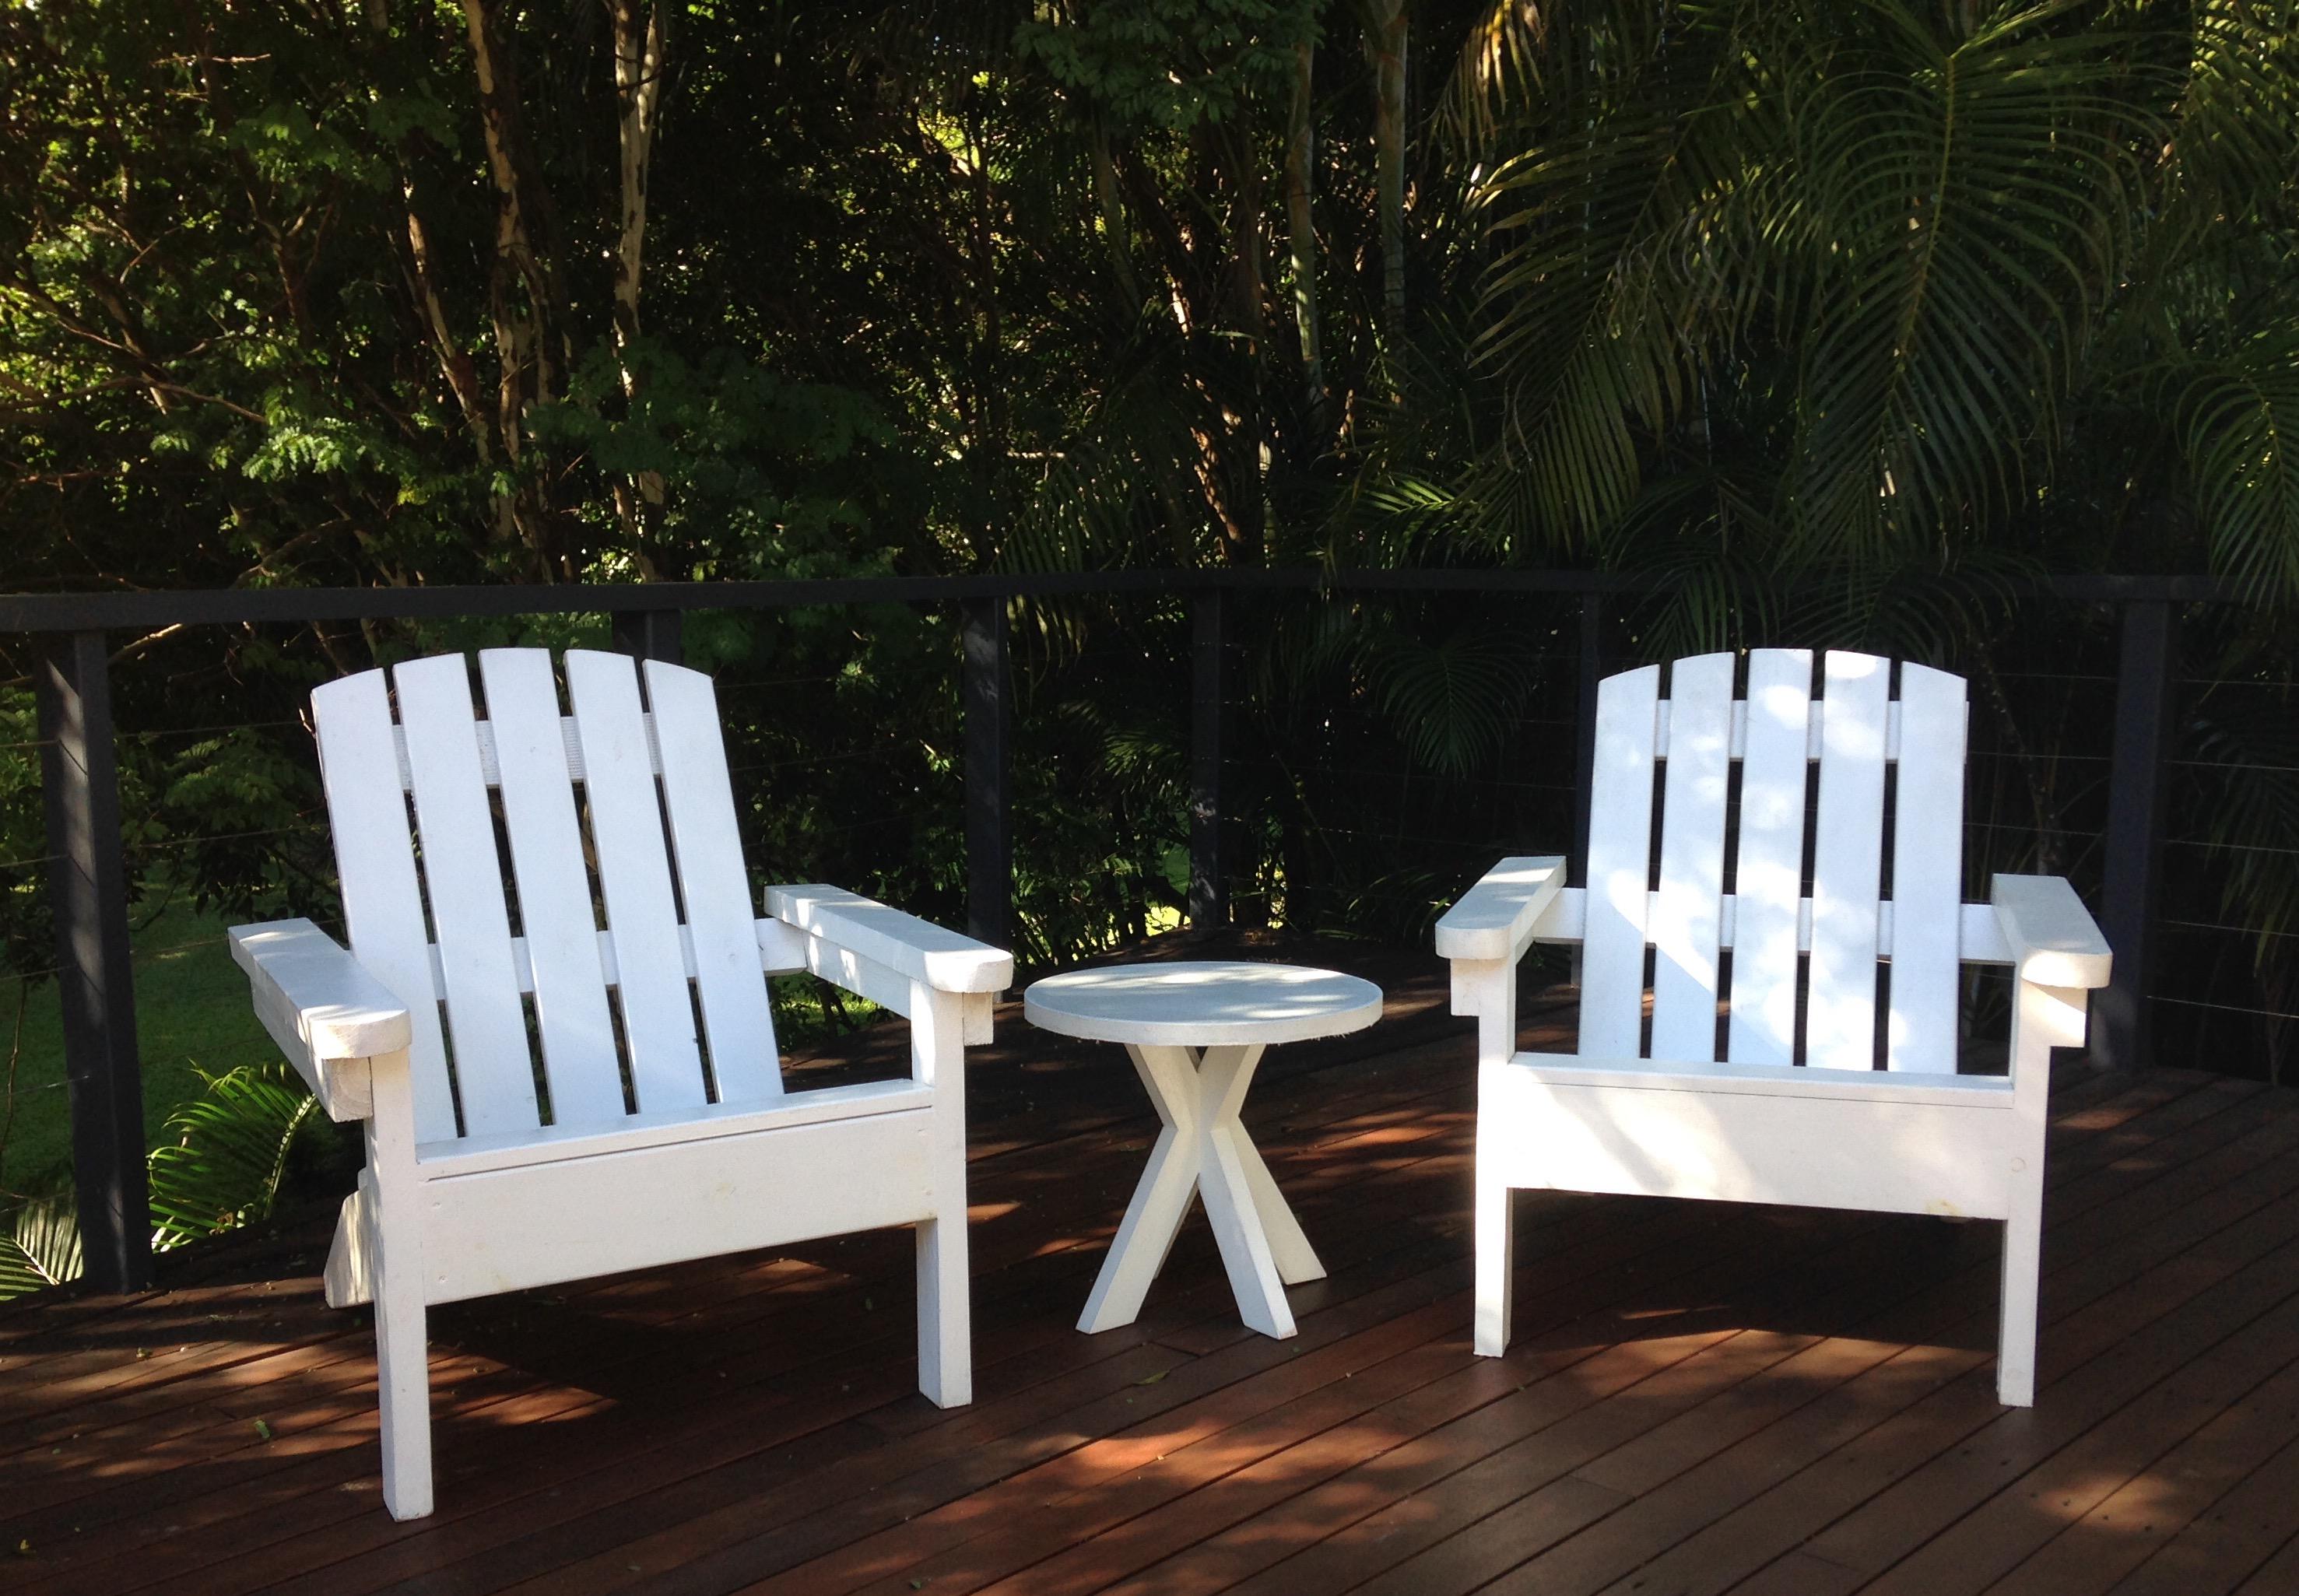 Hamptons white chair